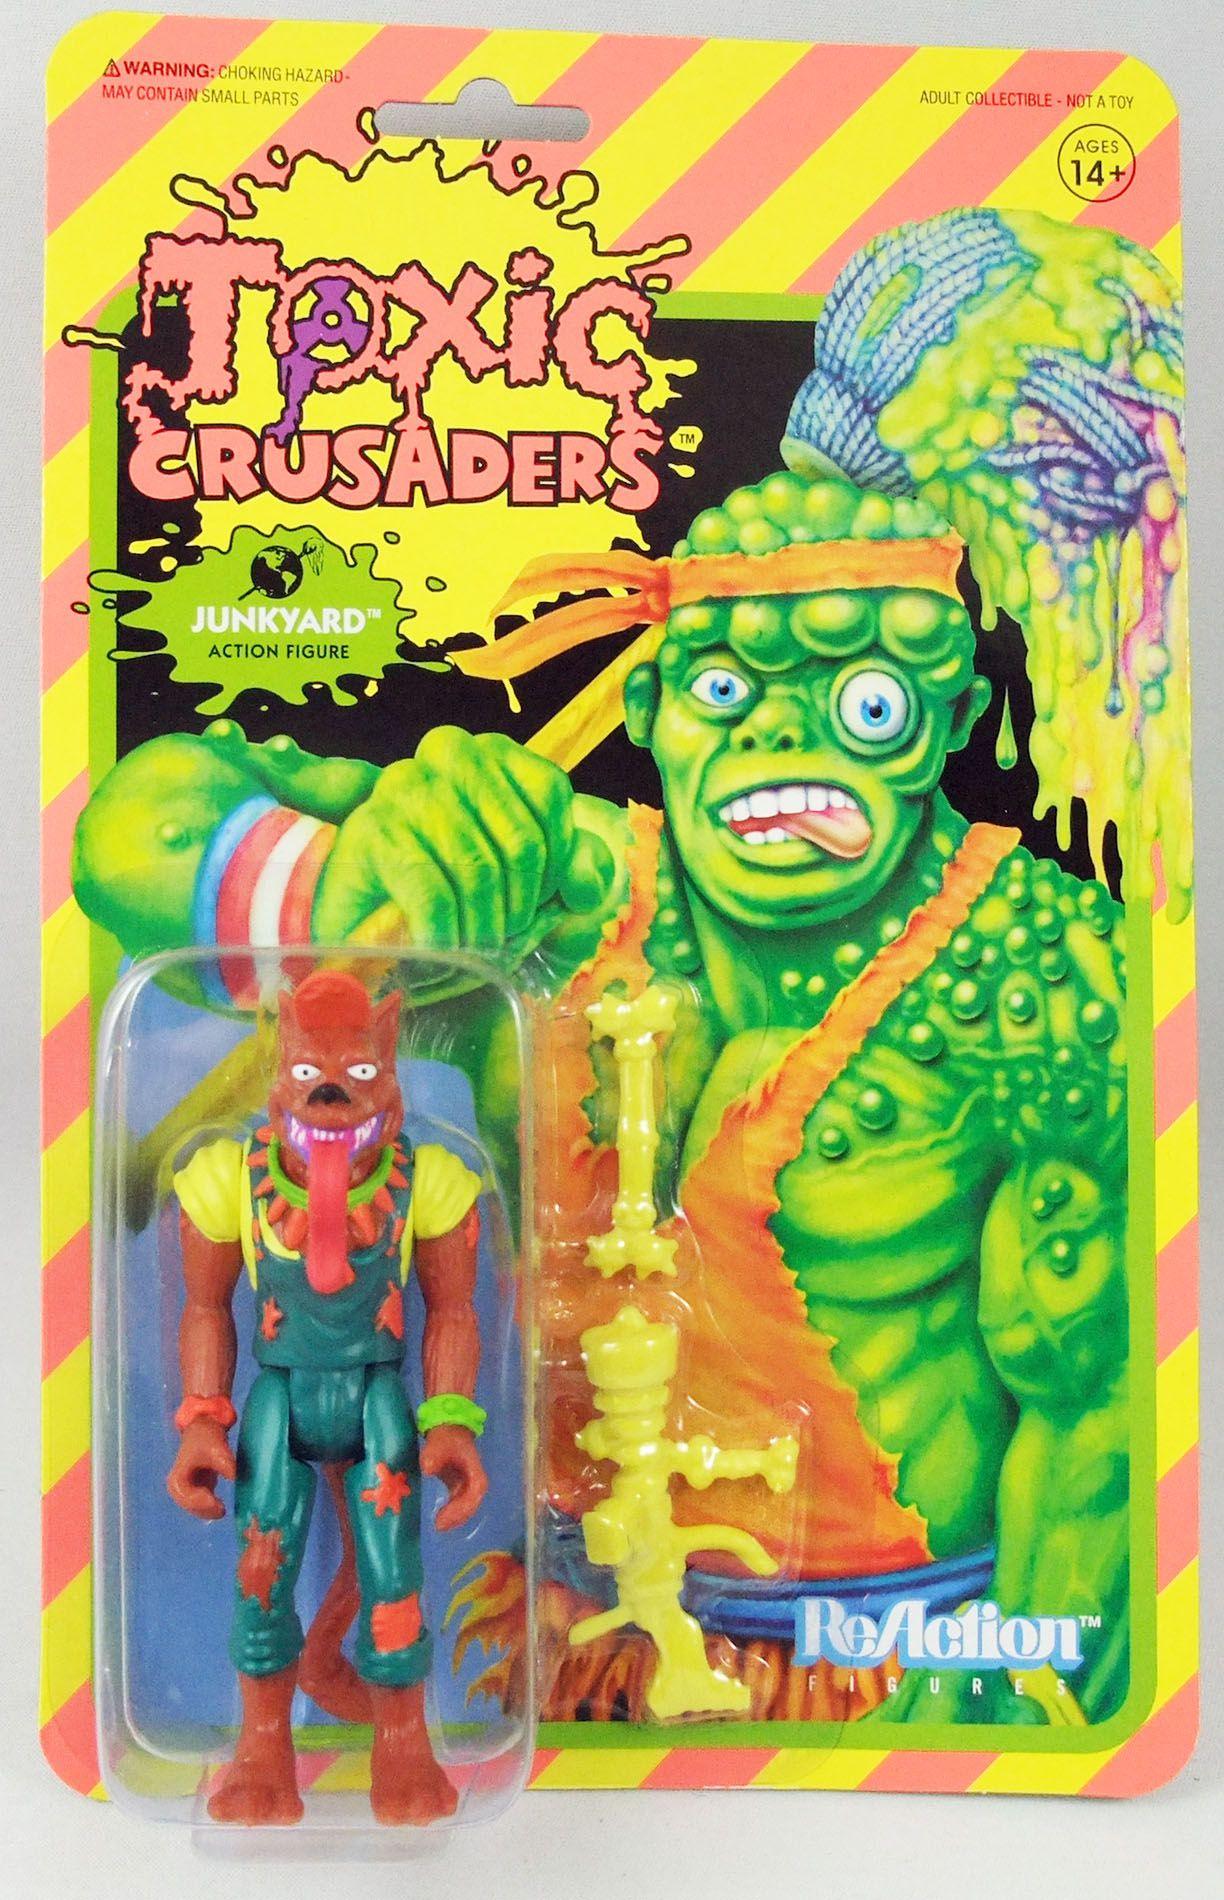 Toxic Crusaders - Super7 - ReAction Figure - Junkyard